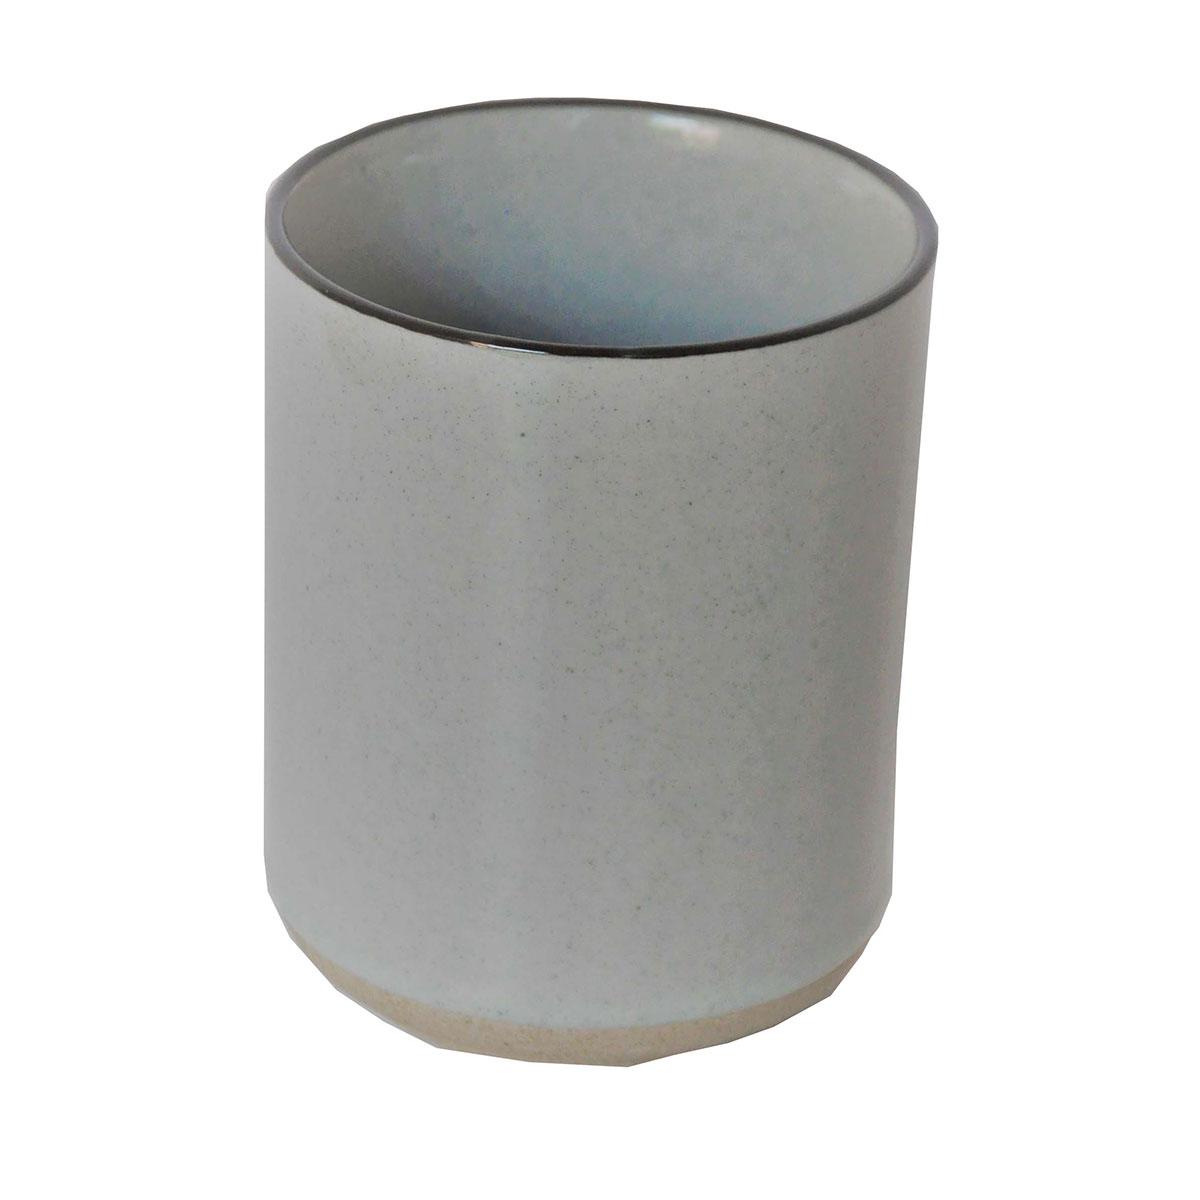 Gobelet bicolore gris